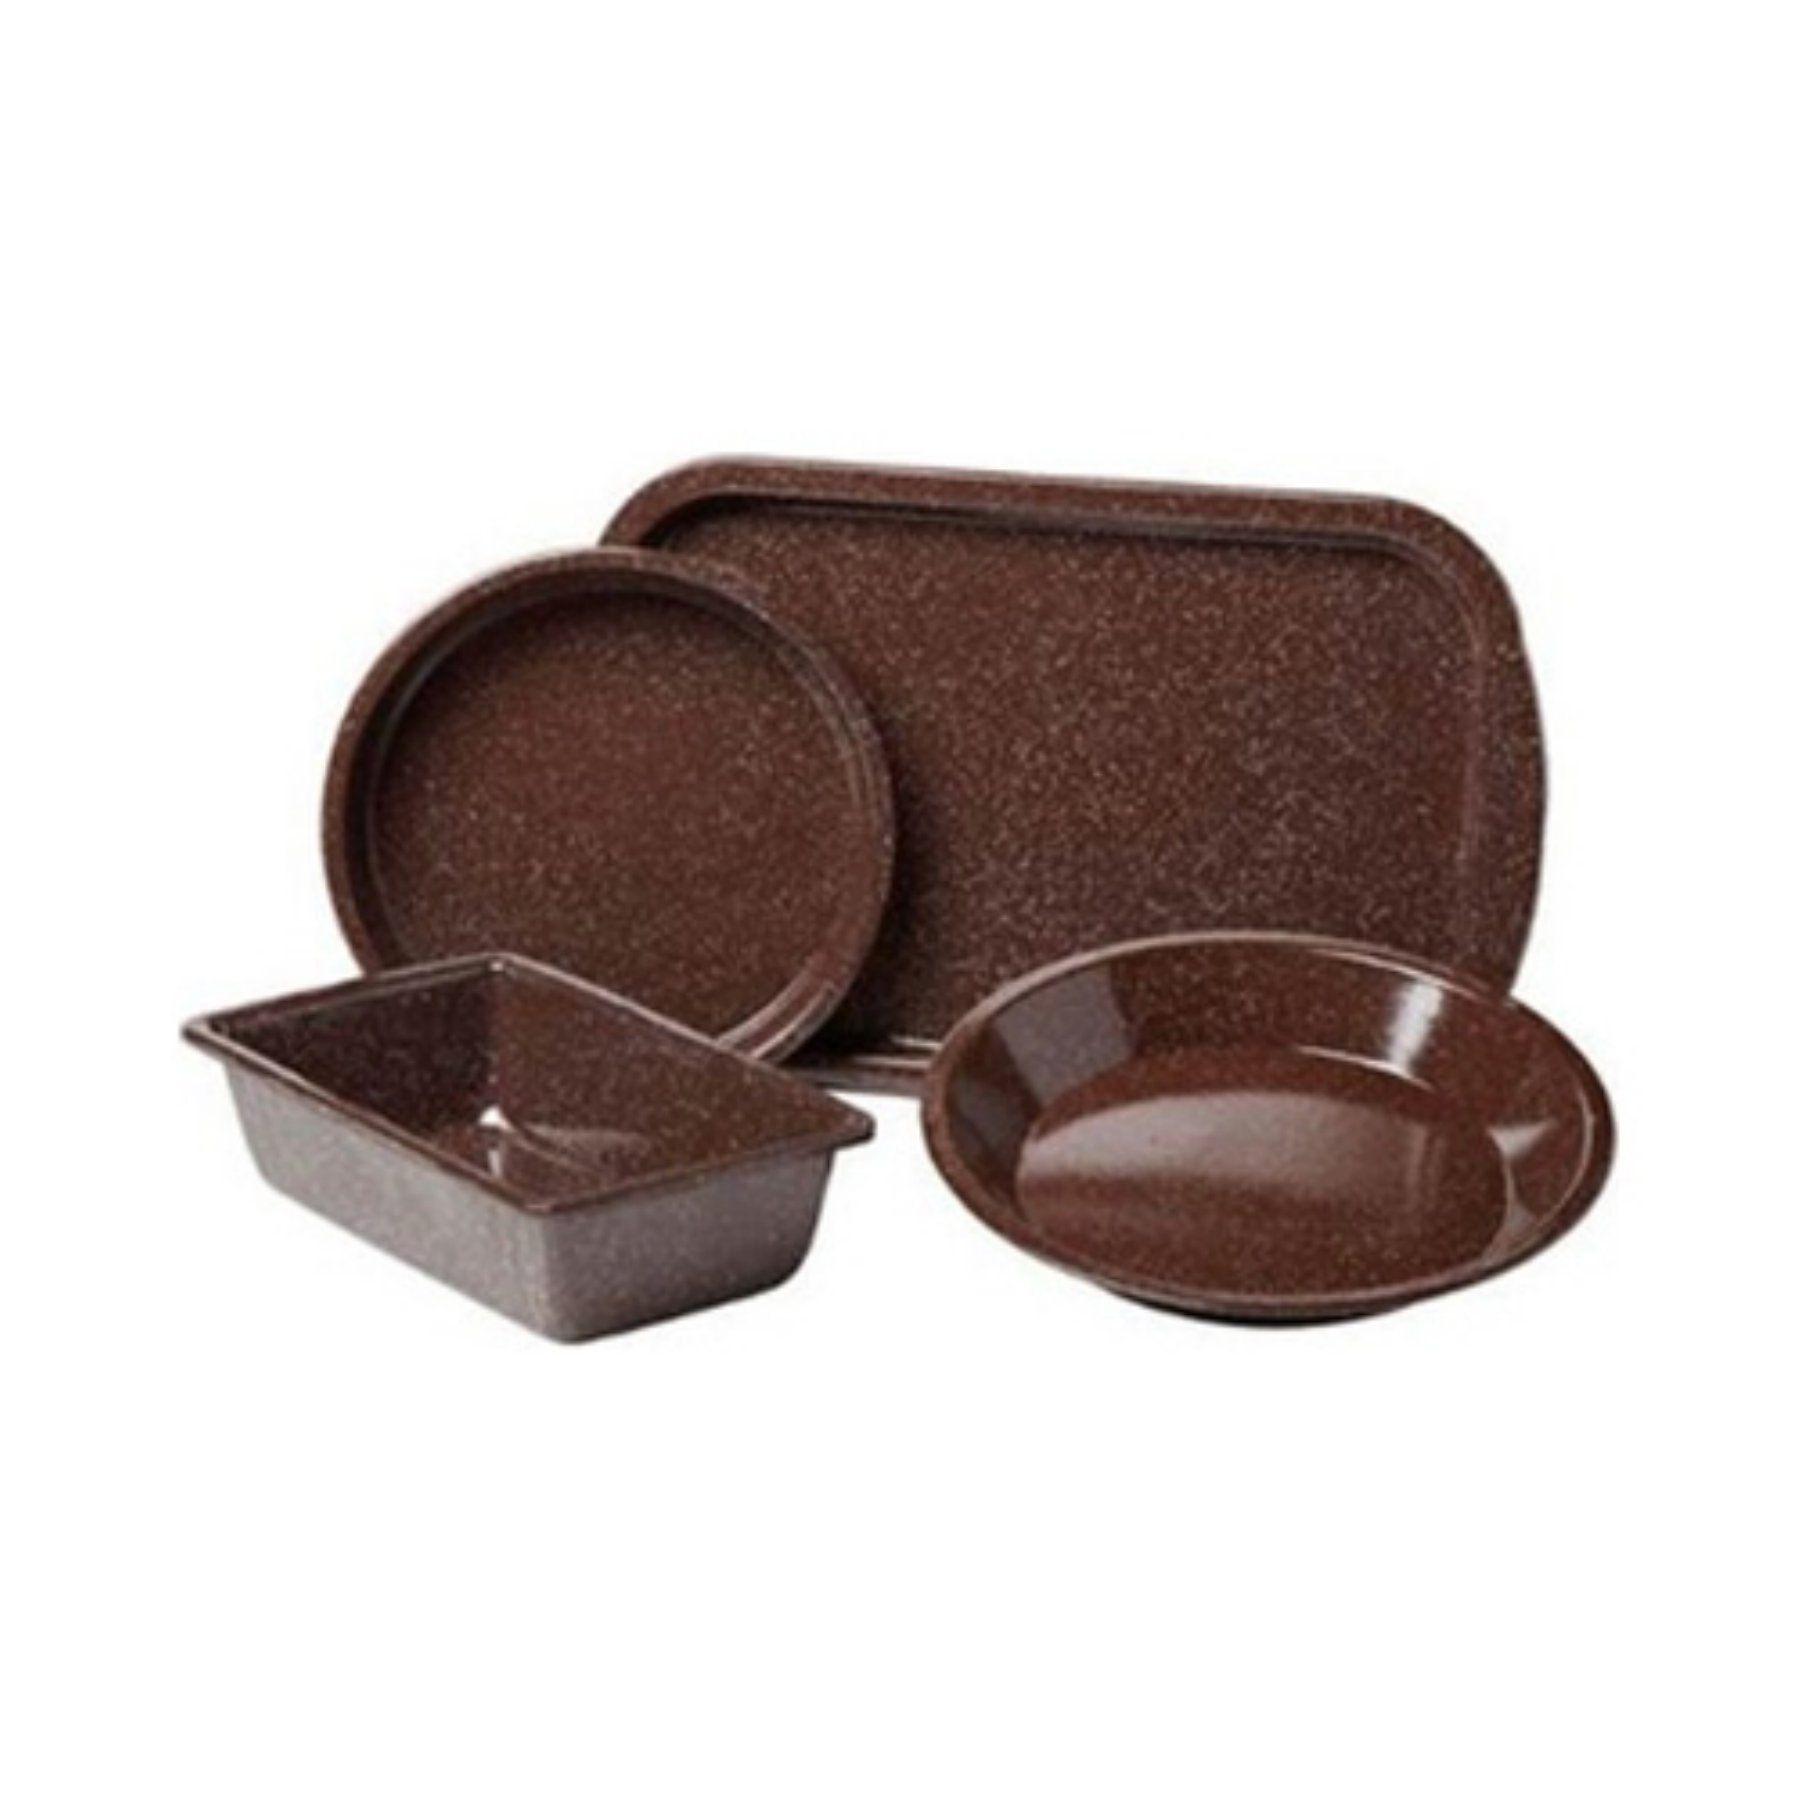 Granite Ware 4 Piece Better Browning Bakeware Set F0631 2